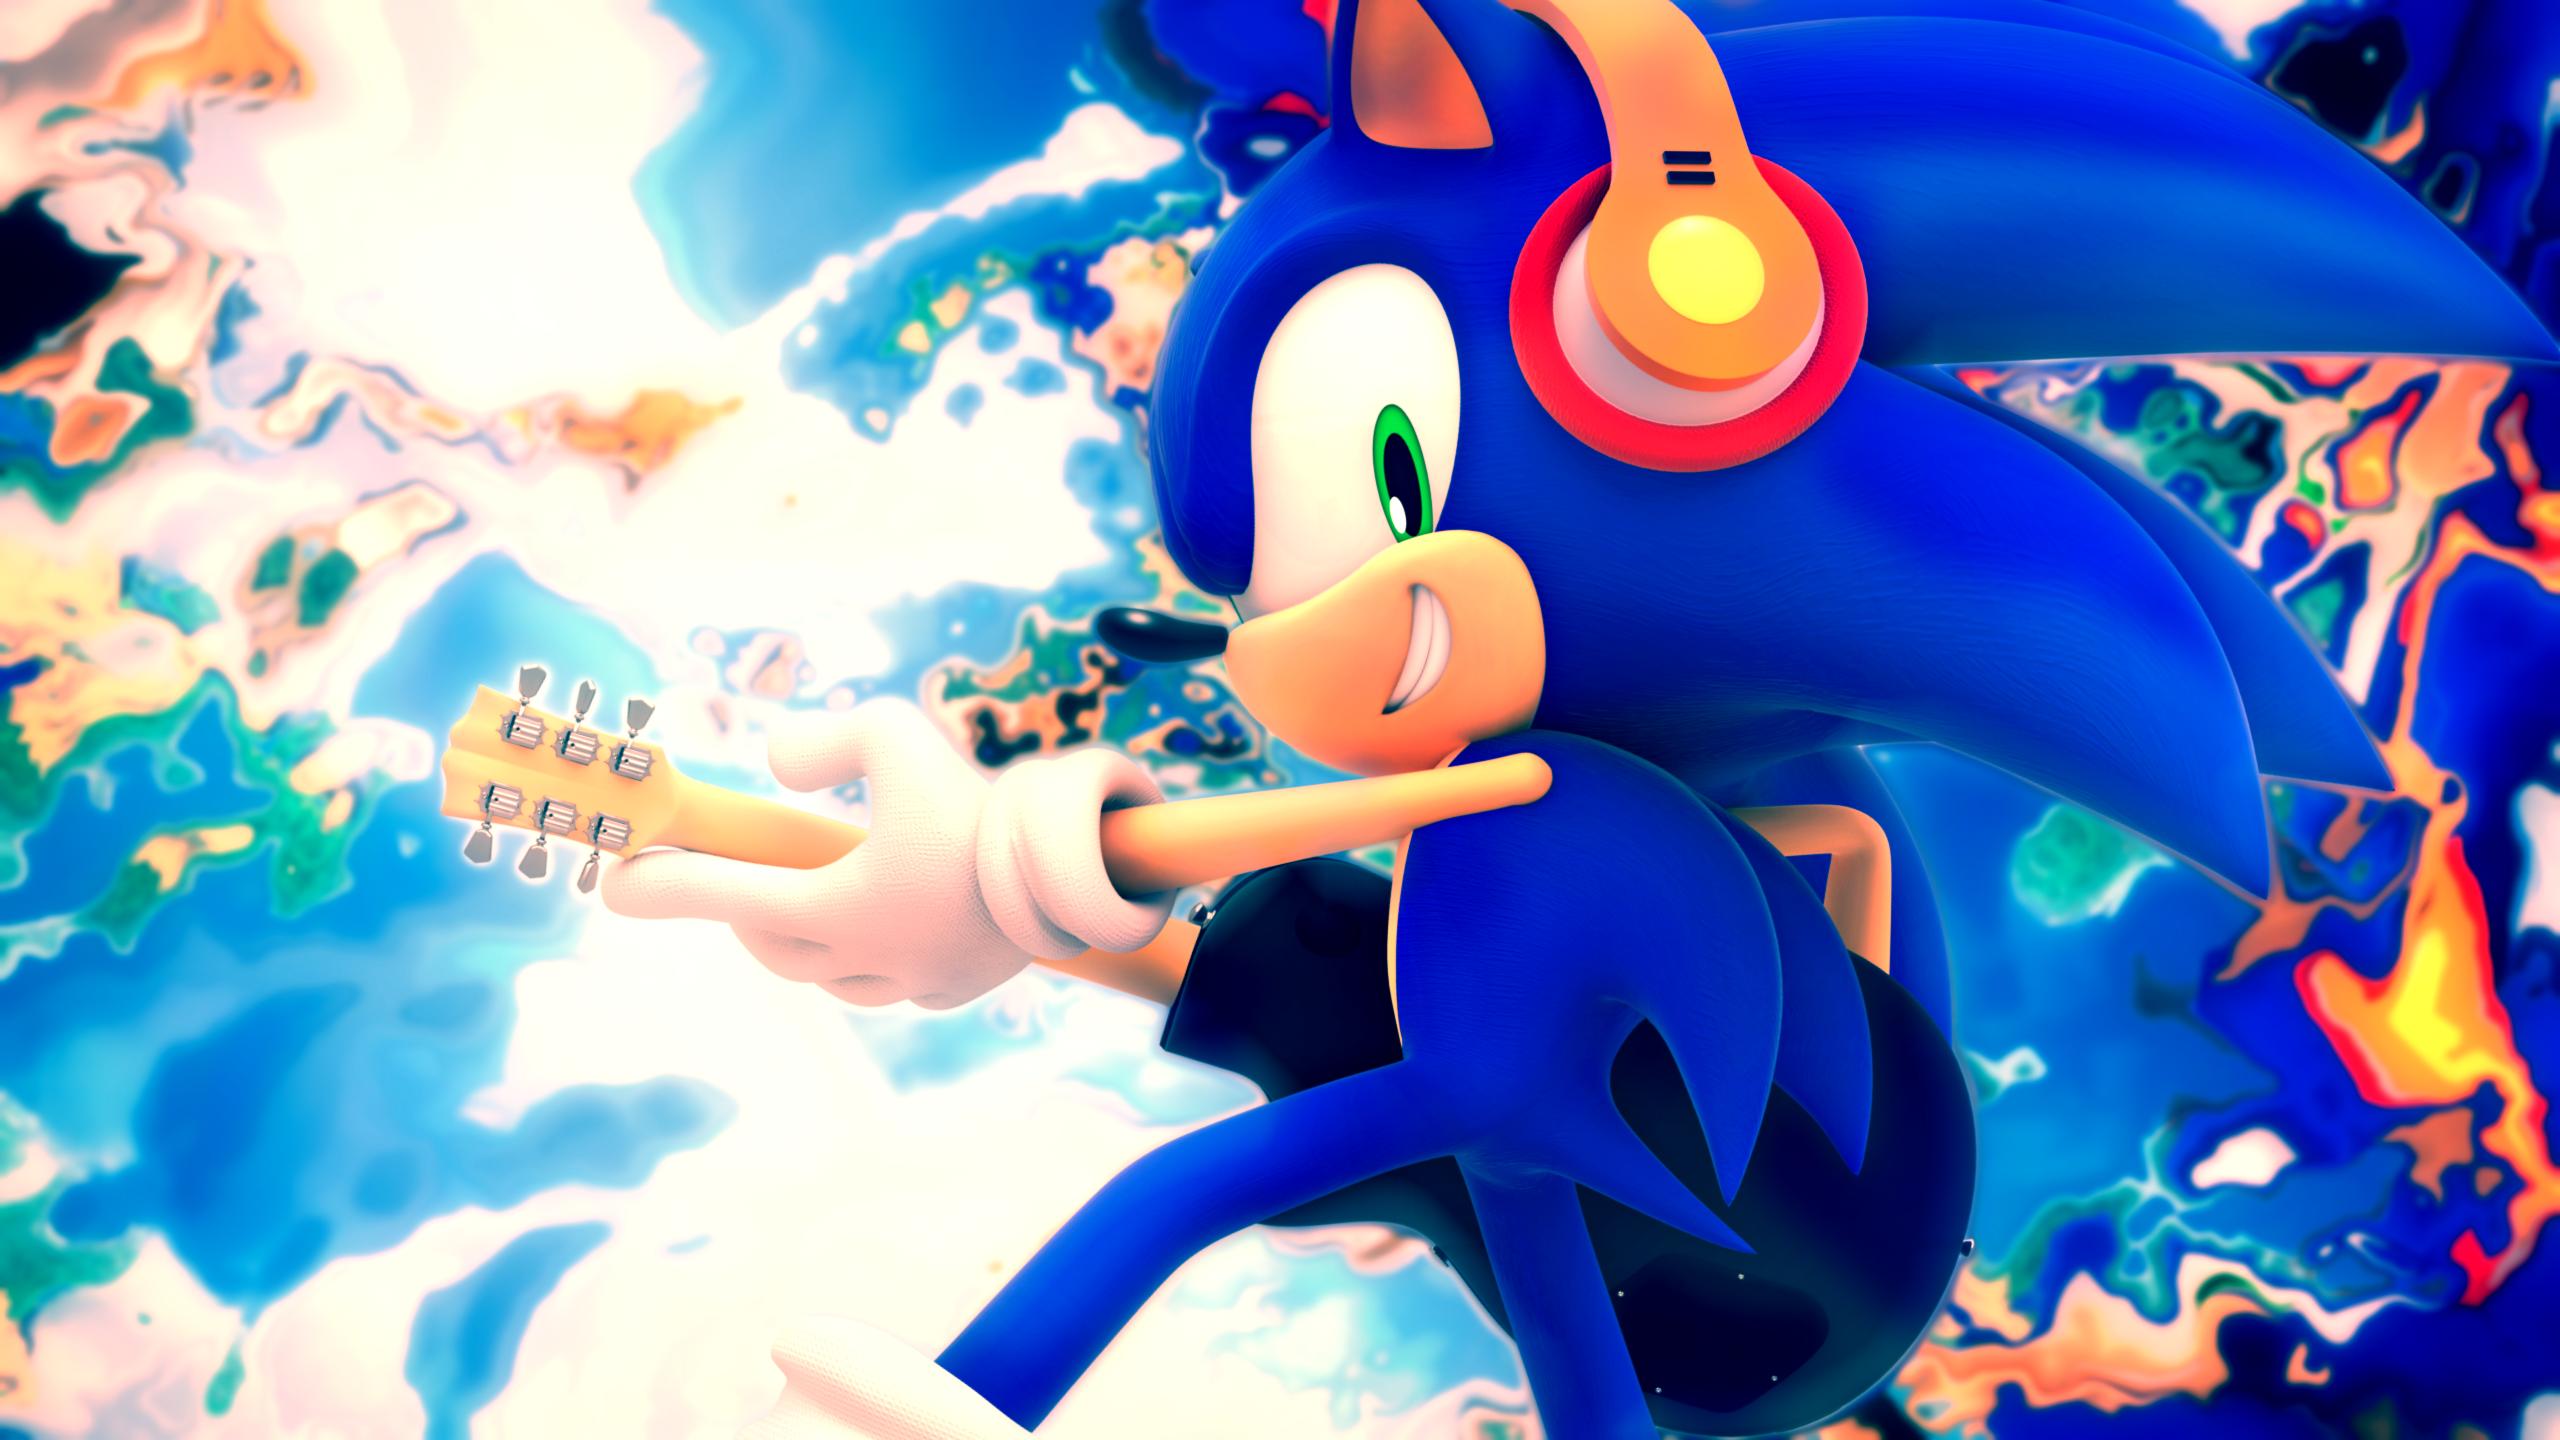 Custom ADX 1.0 Mod For Sonic Adventure 2